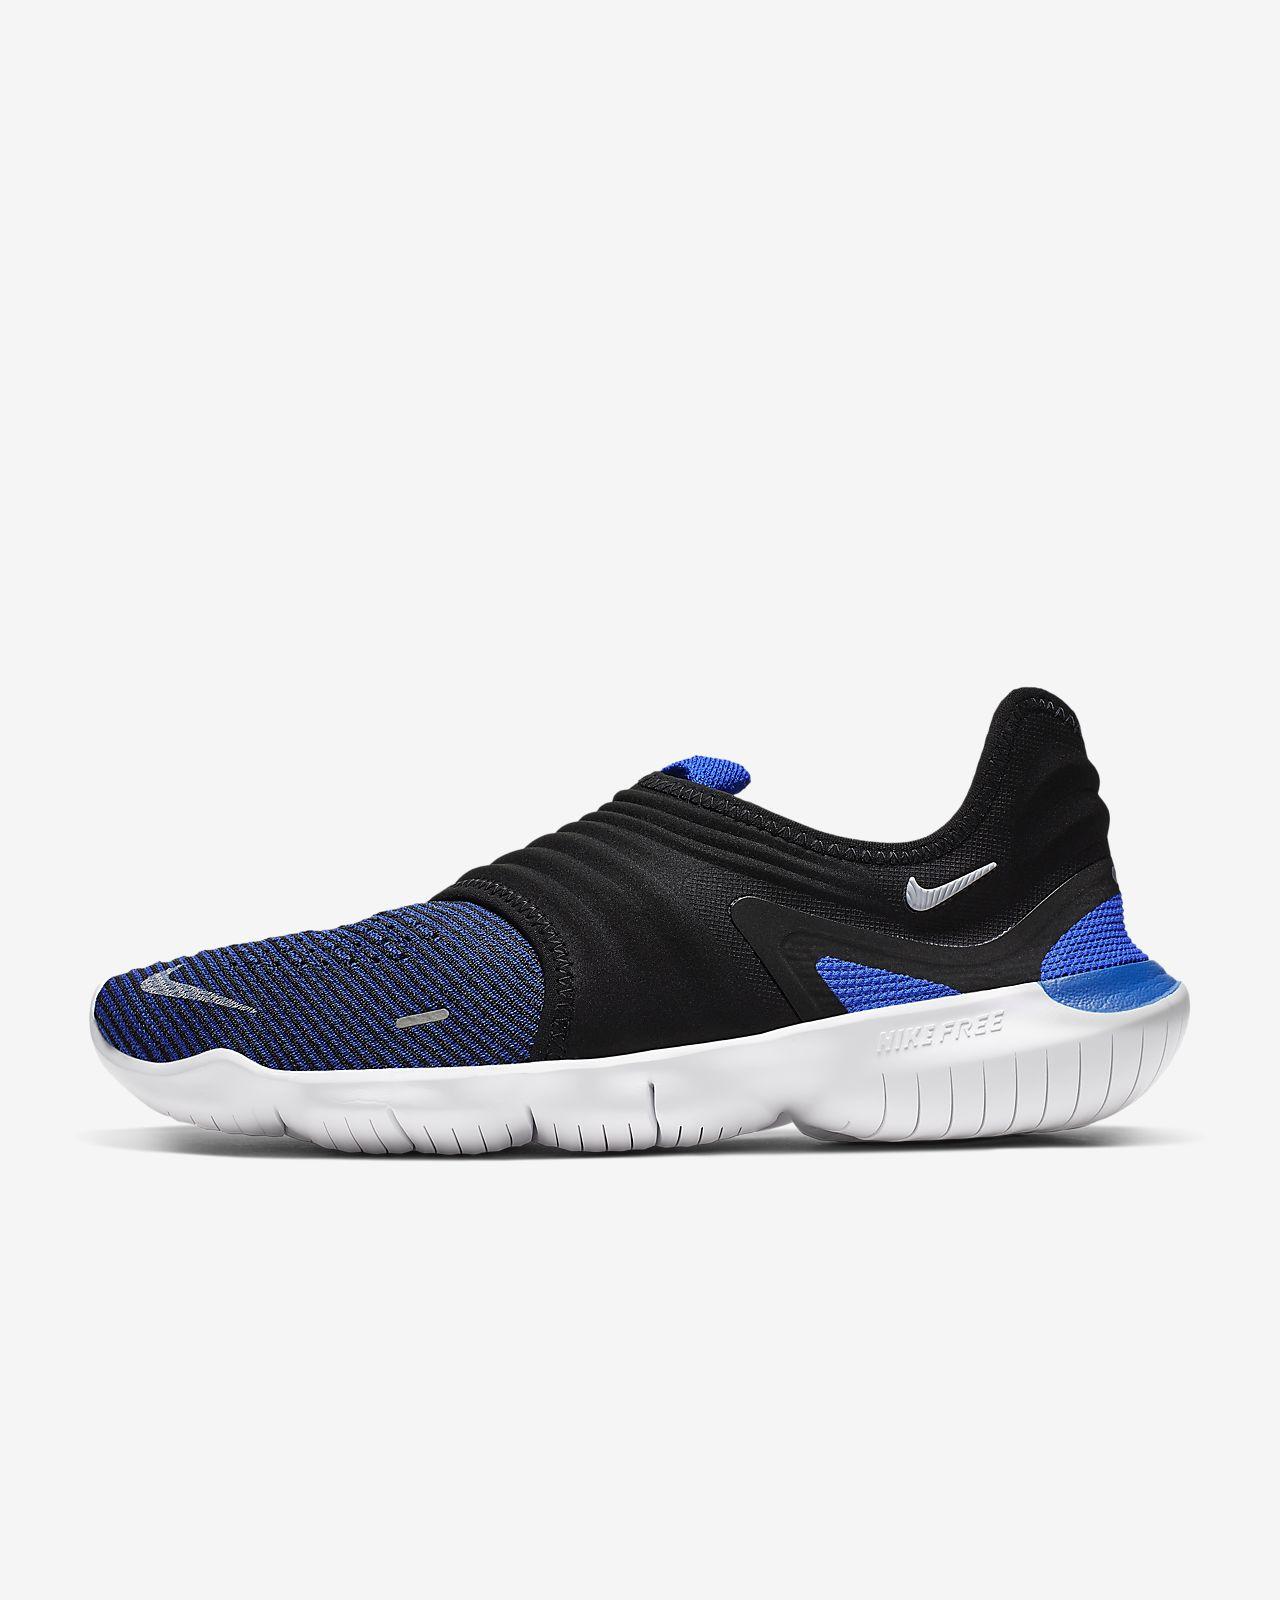 24 Best nike free run 3 images | Nike free run 3, Nike free